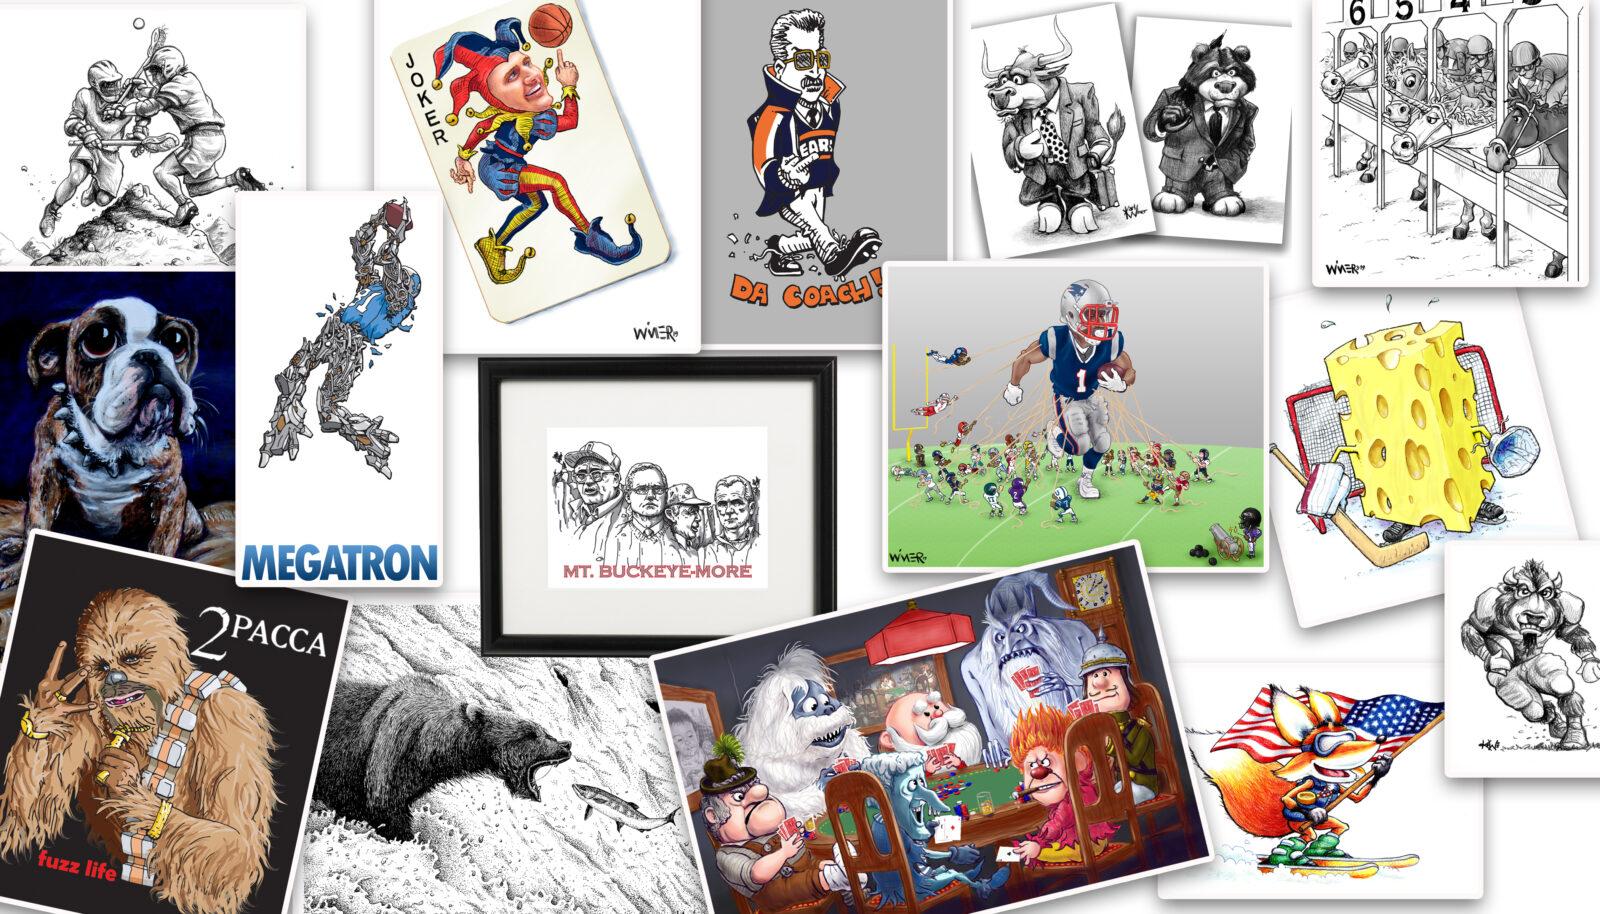 Etsy Images Cartoons Illustrations for WimerWorks